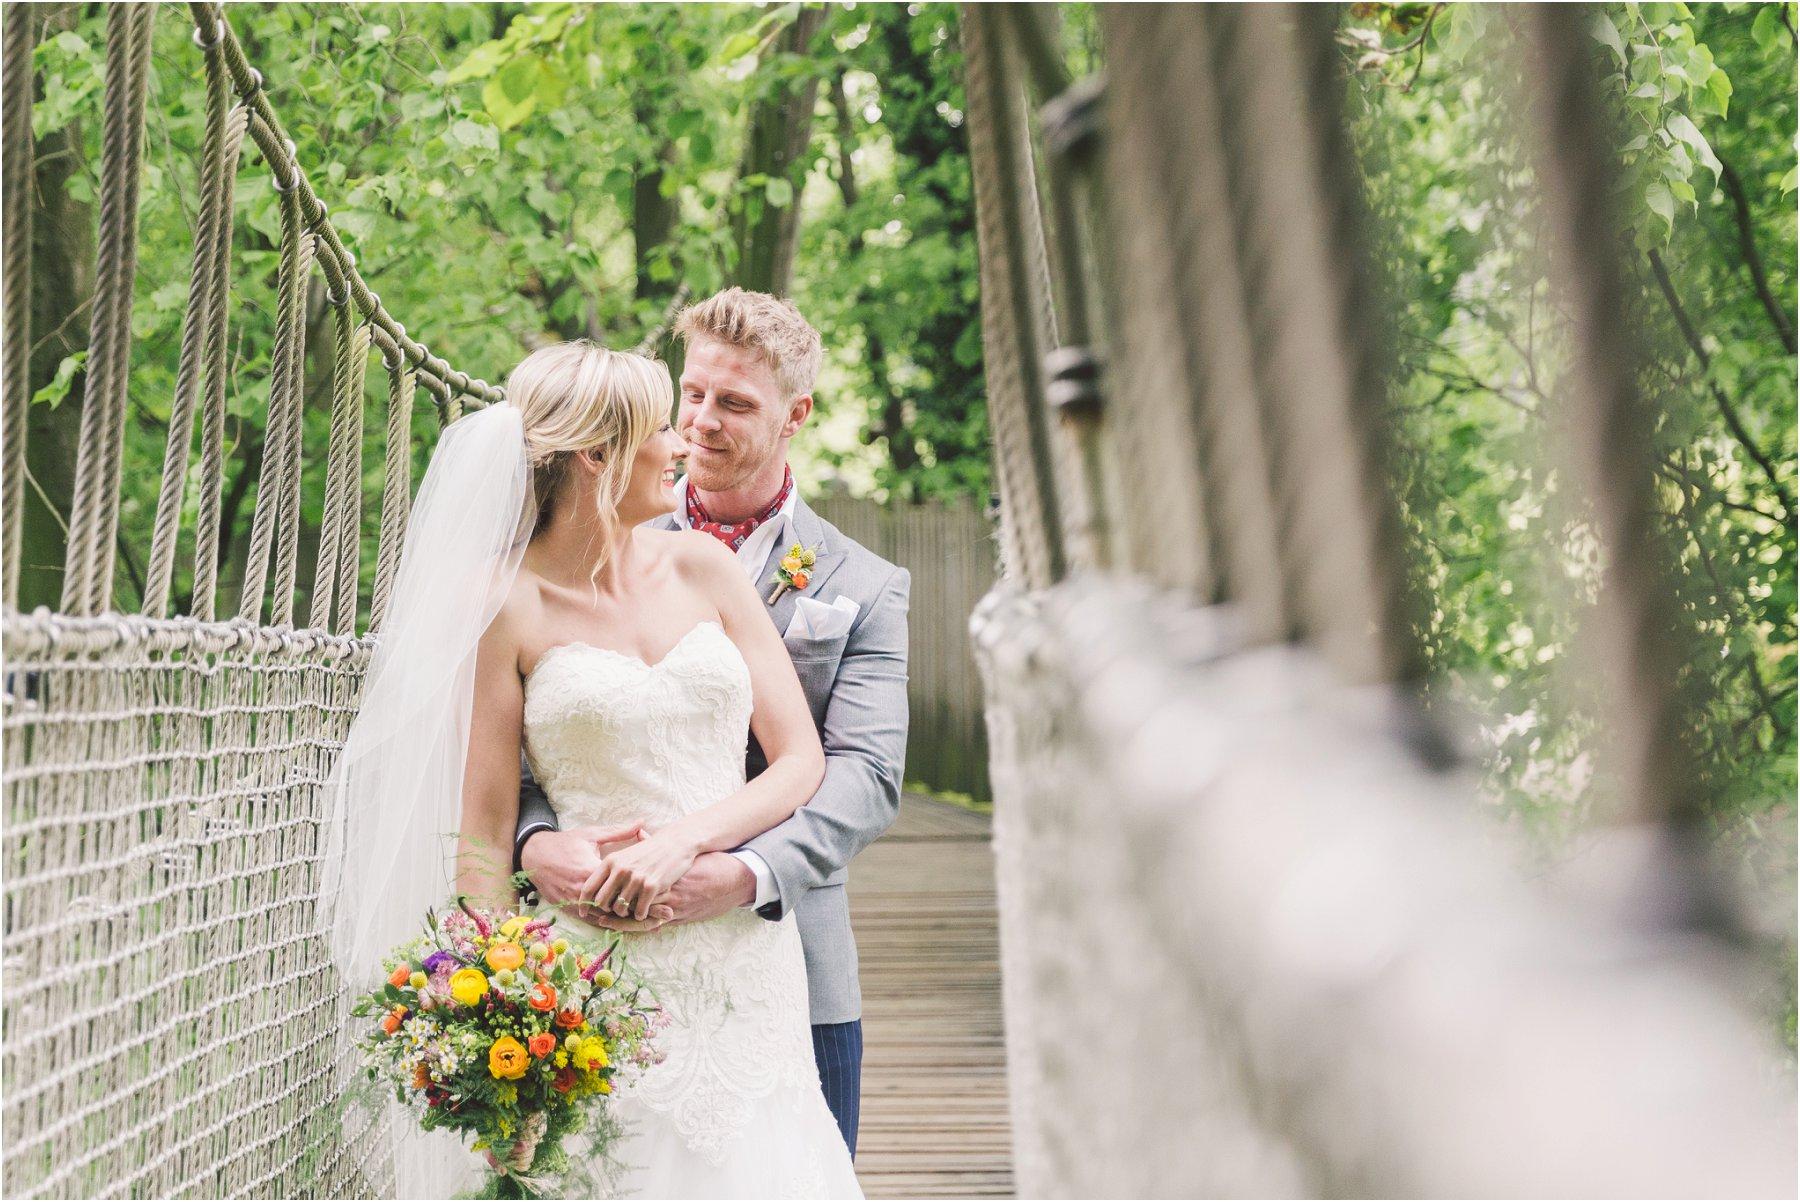 eve.photography.relaxed.creative.wedding.destination._0283.jpg